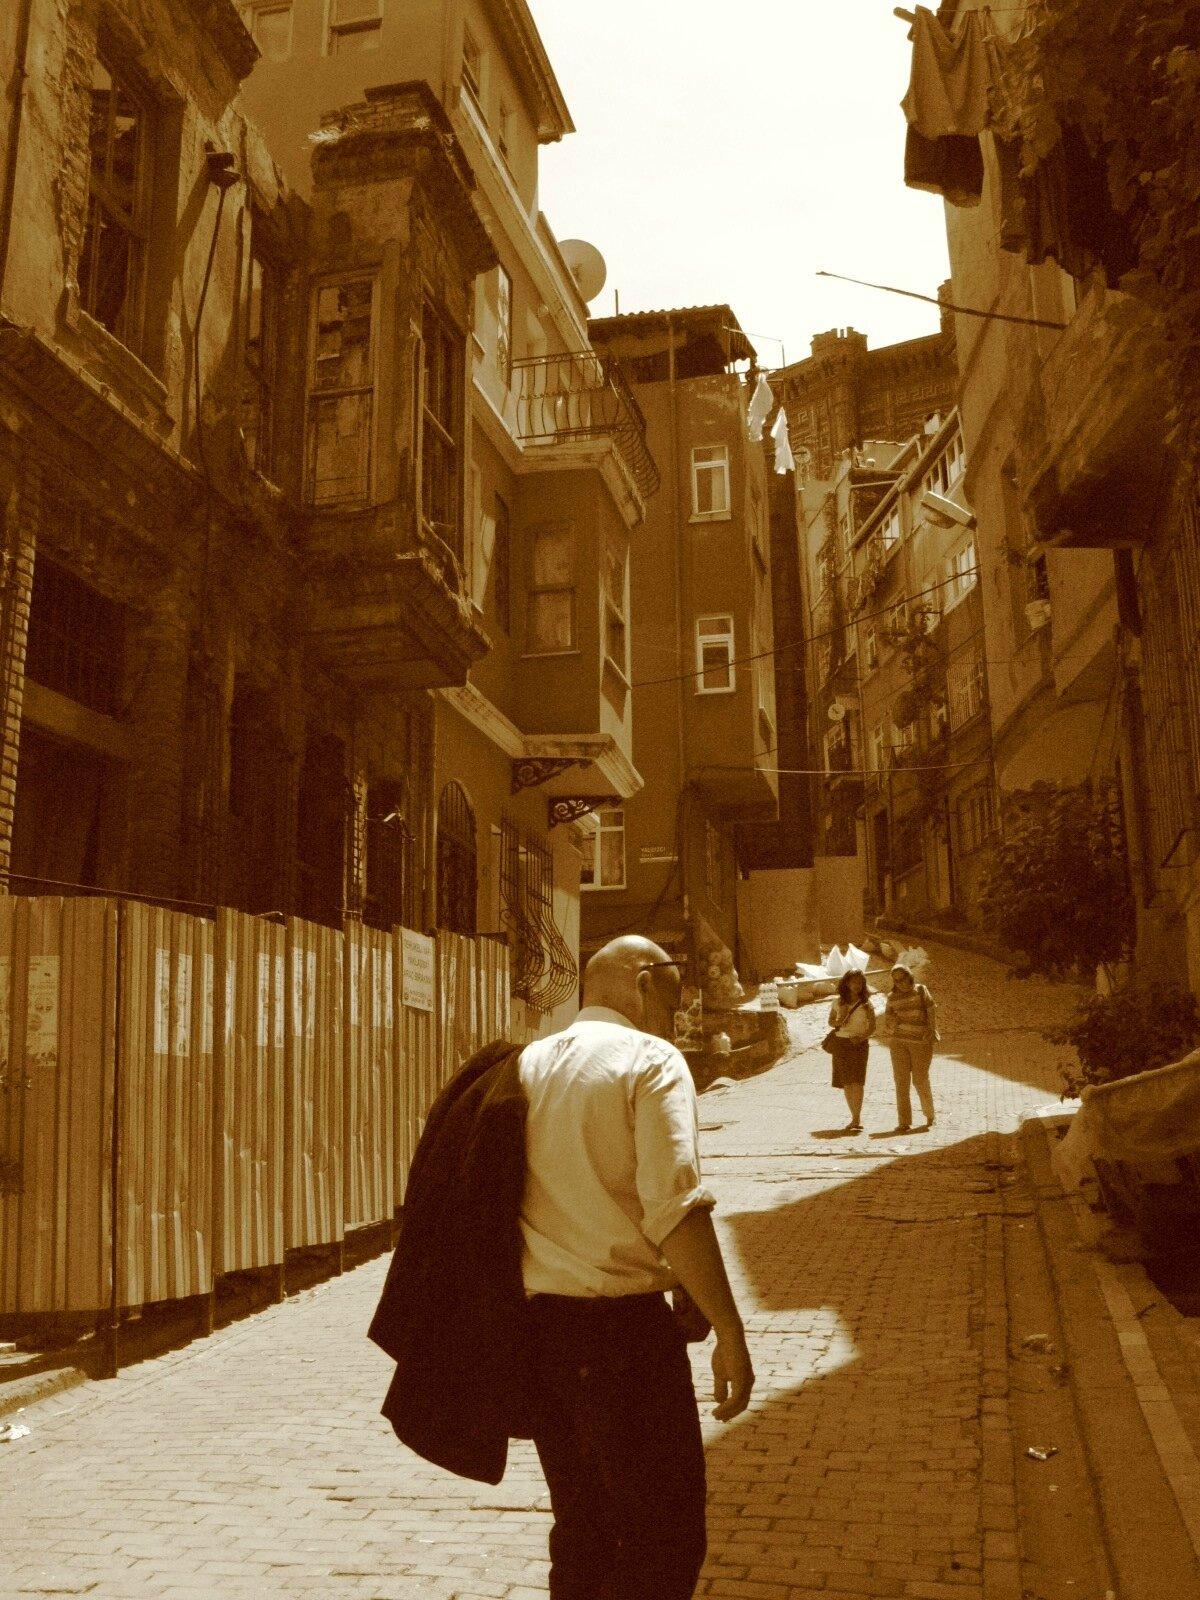 istanbul 2007 fatih - copie 2